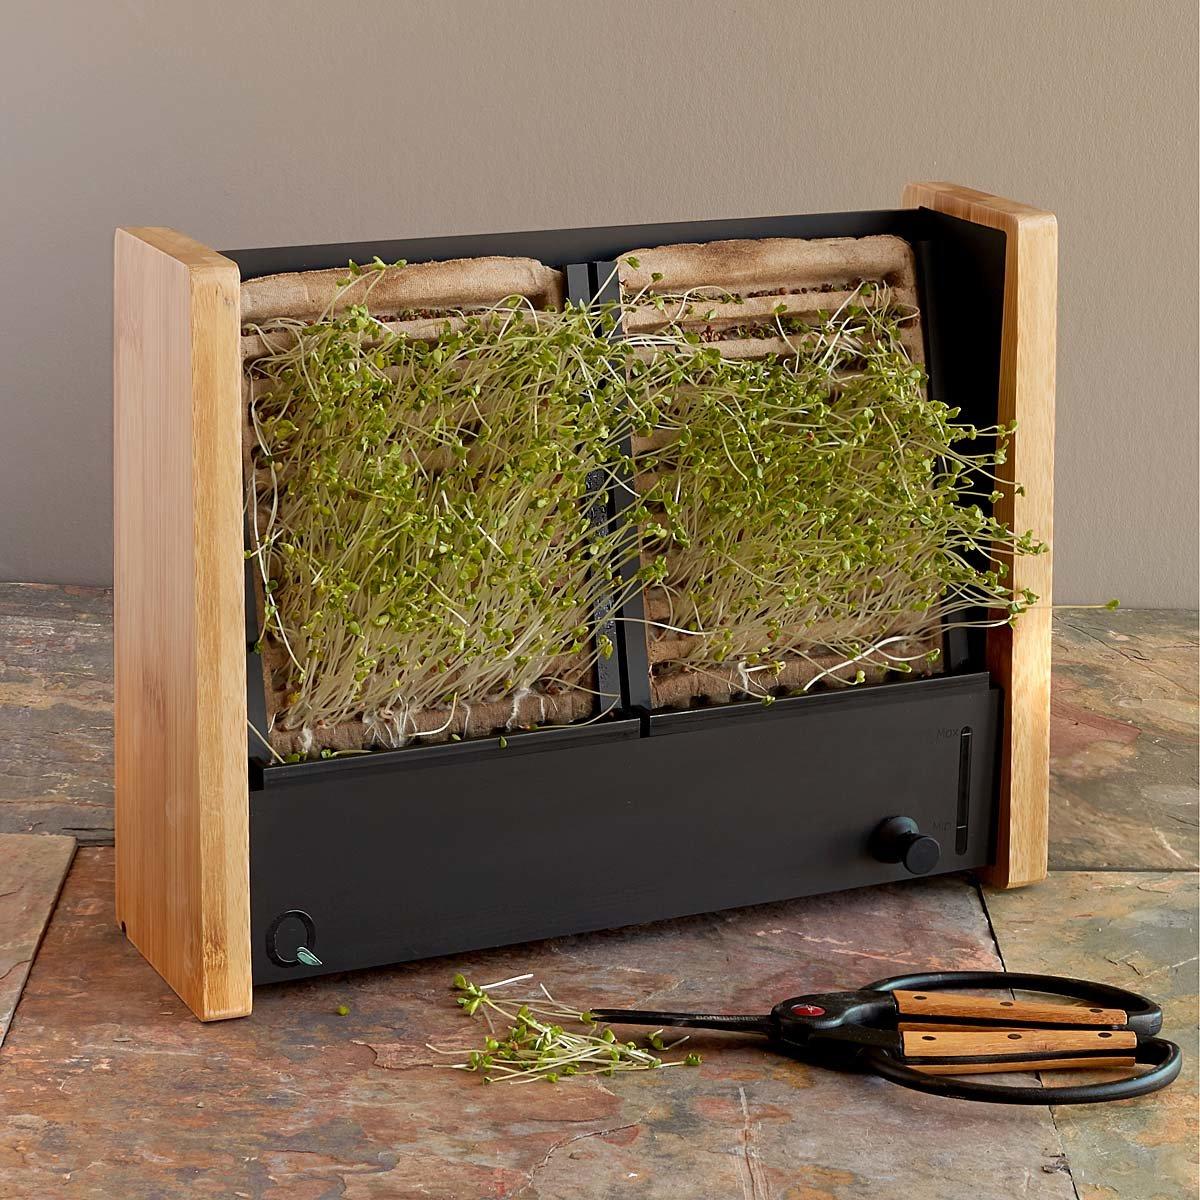 Salsa Grow Kit | gardening kit, diy recipe | UncommonGoods